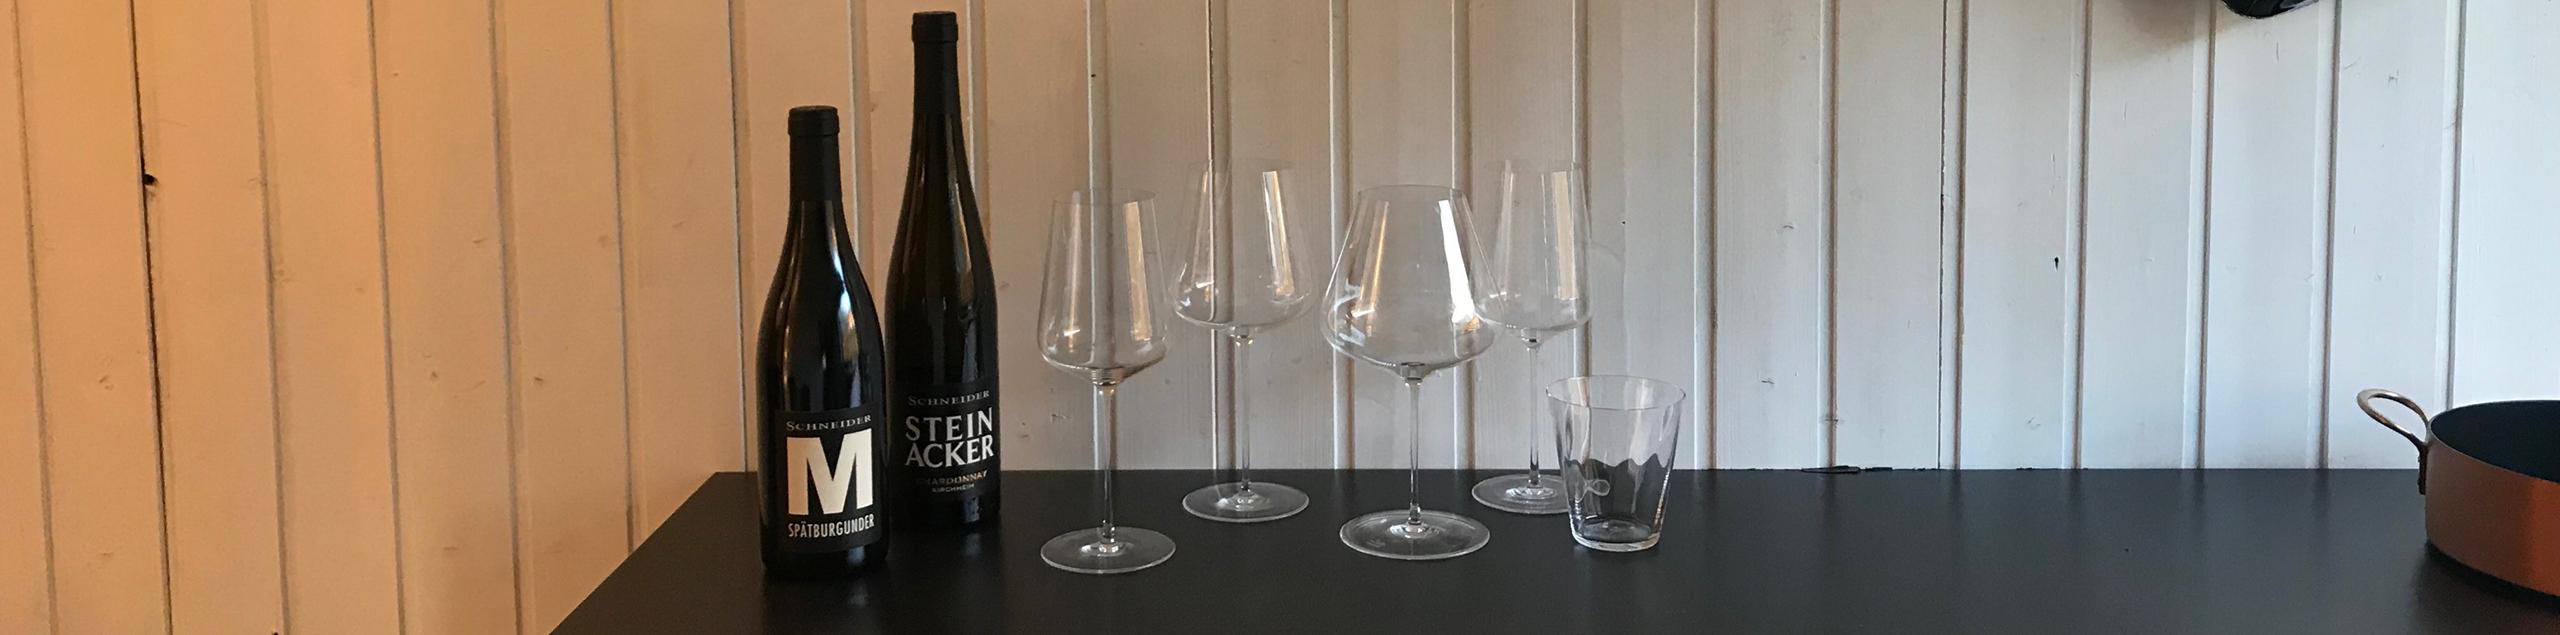 BANNER GLAS